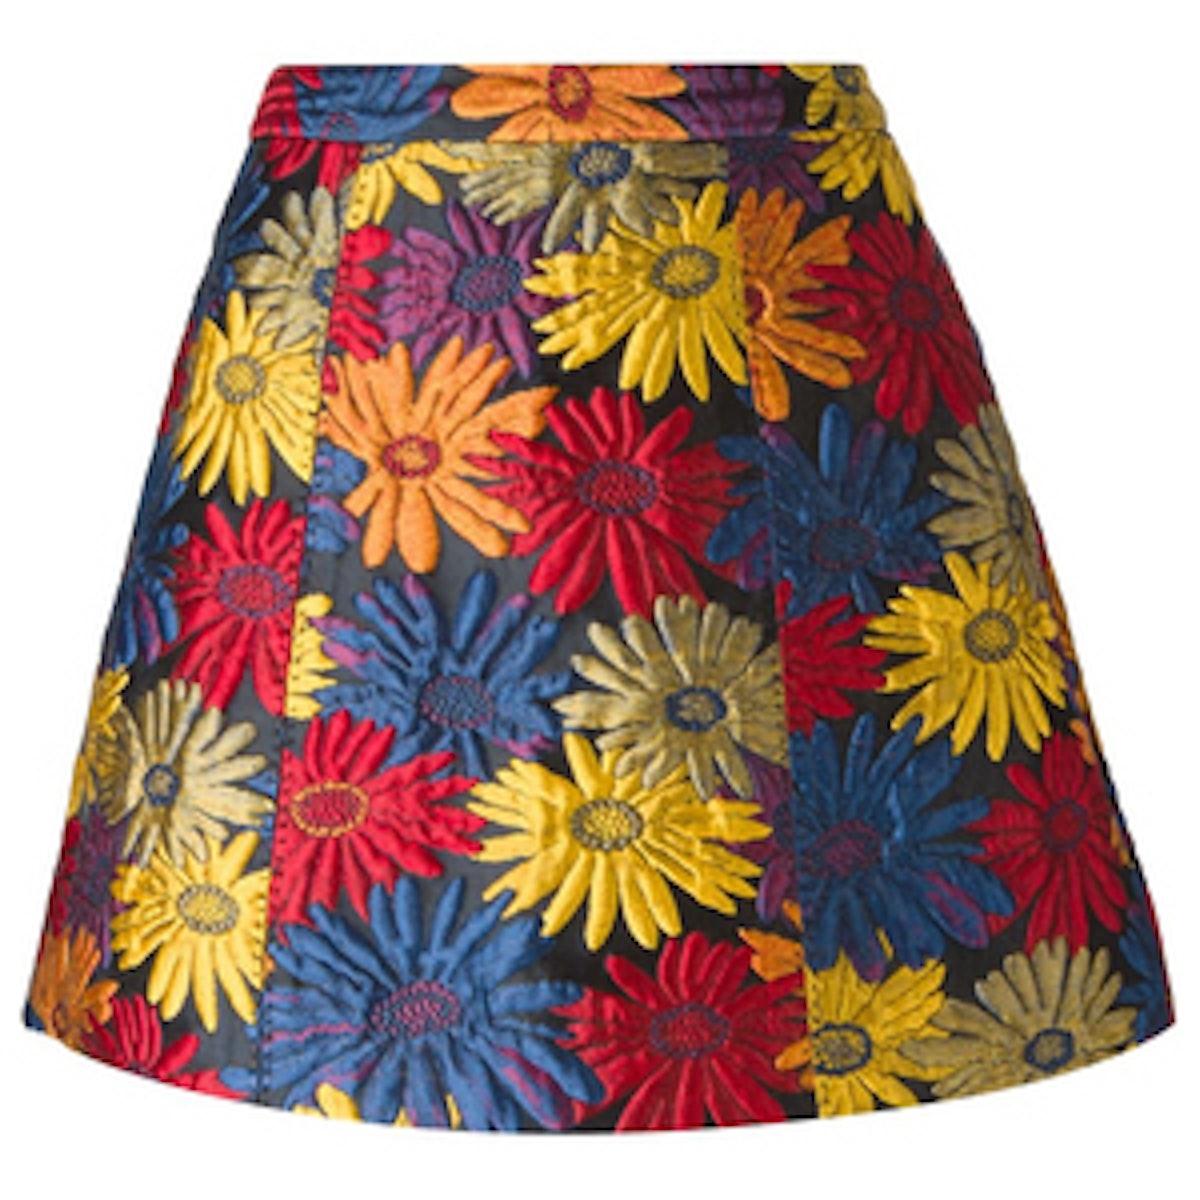 Loran Skirt